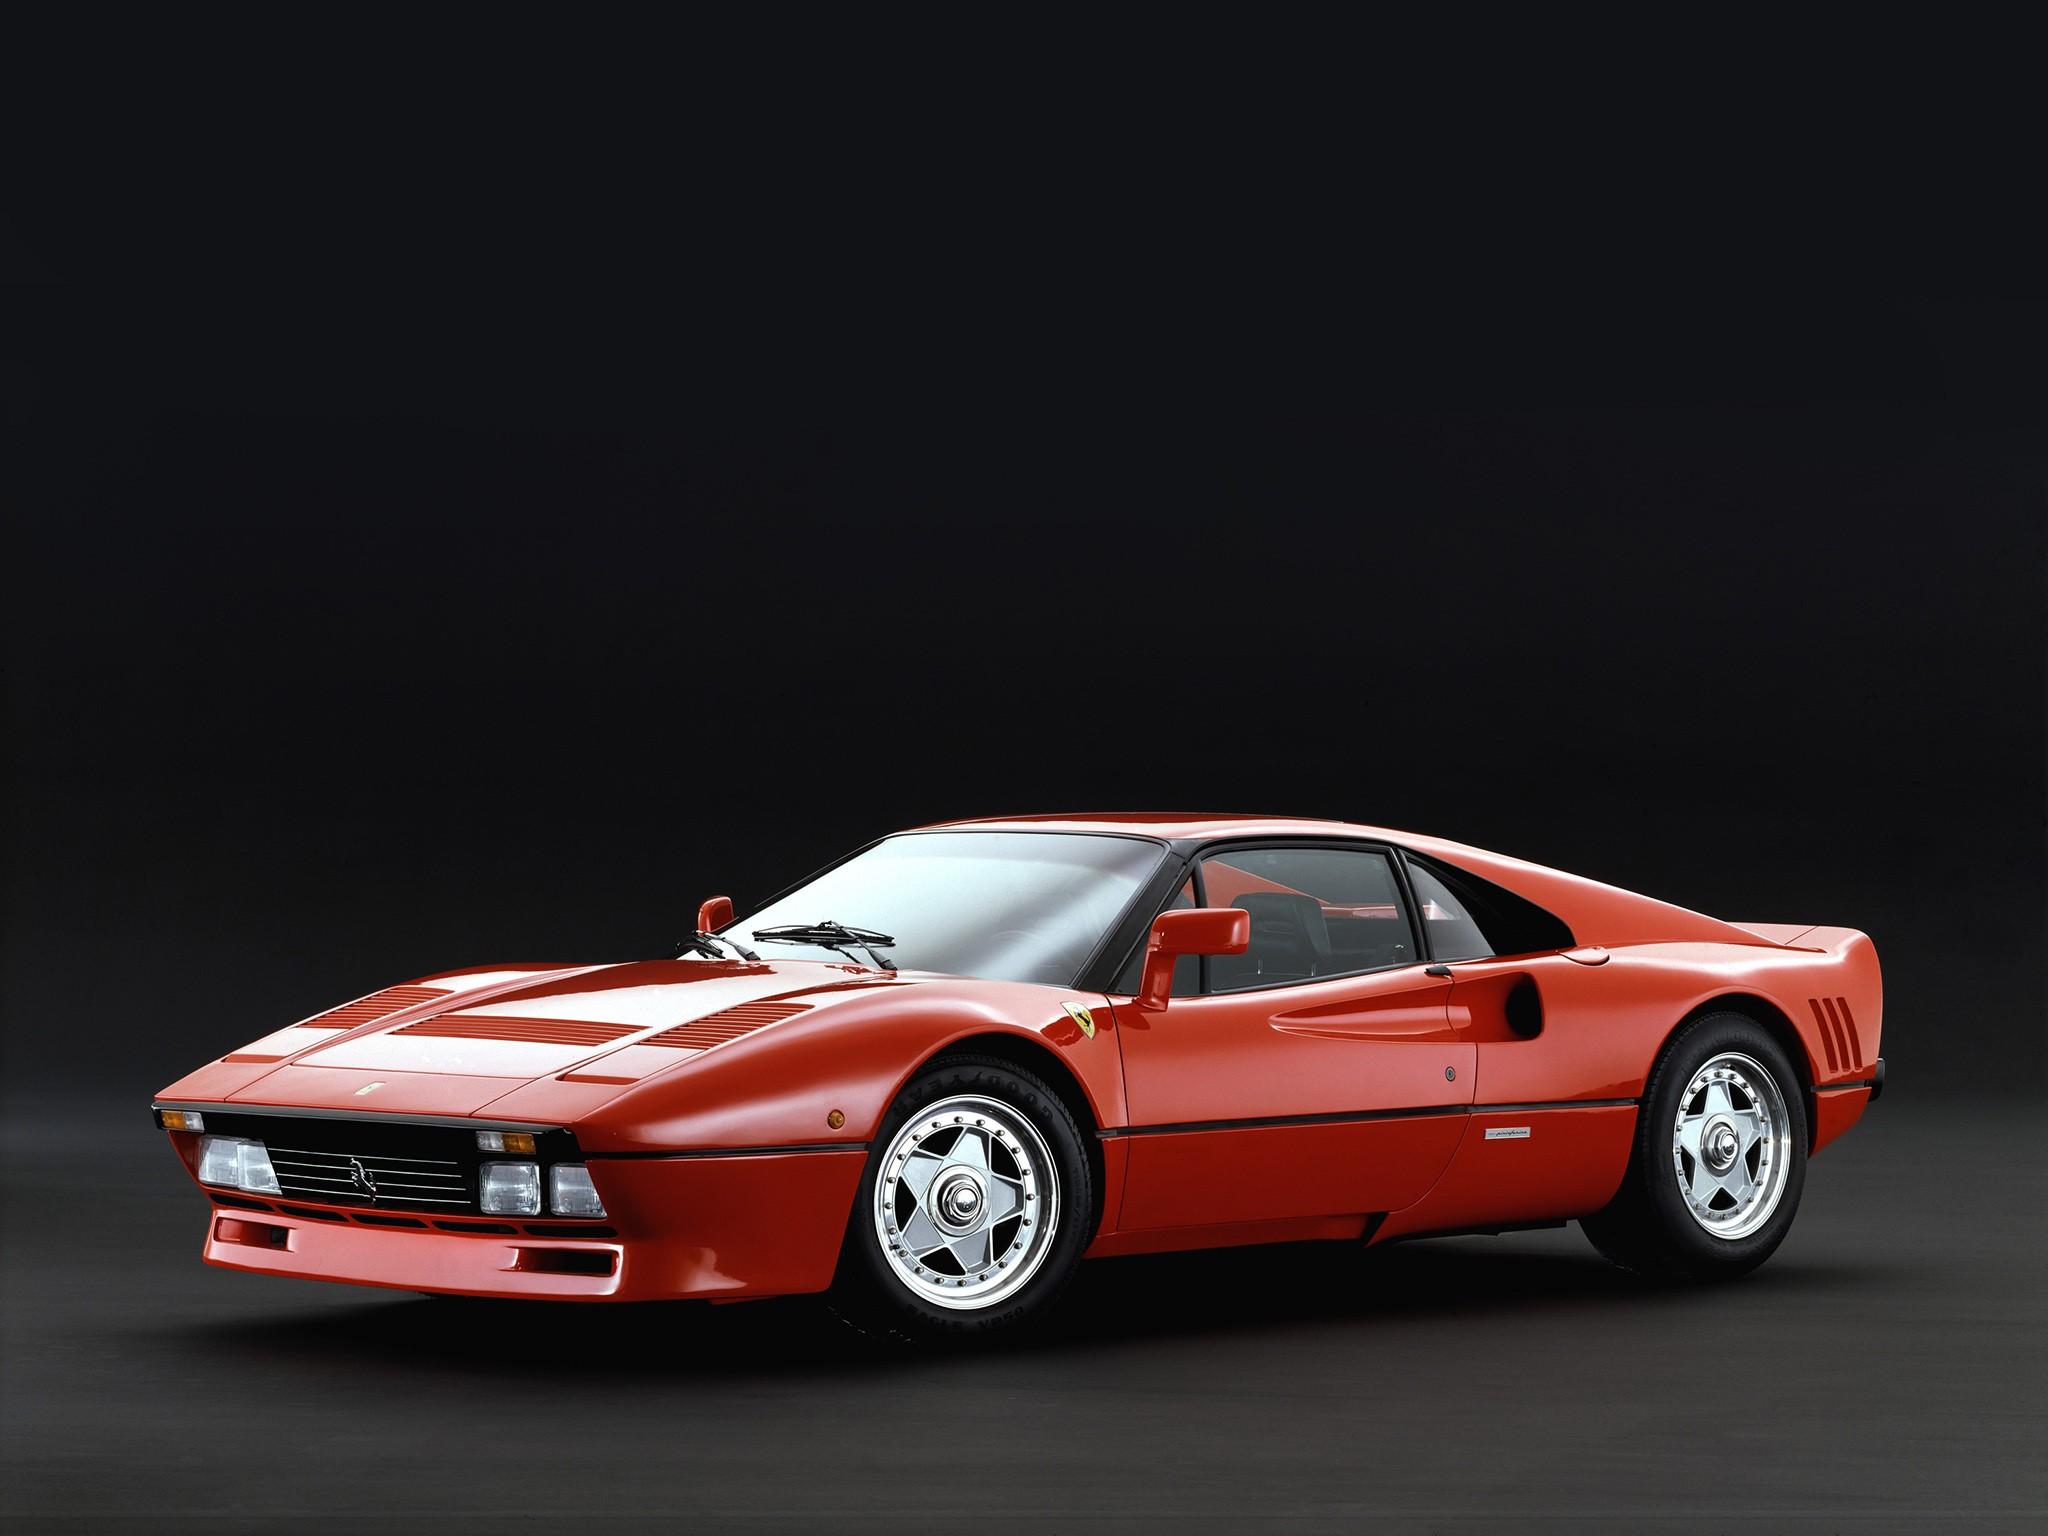 Ferrari 288 Gto Spezifikationen Fotos 1984 1985 1986 Autoevolution In Deutscher Sprache